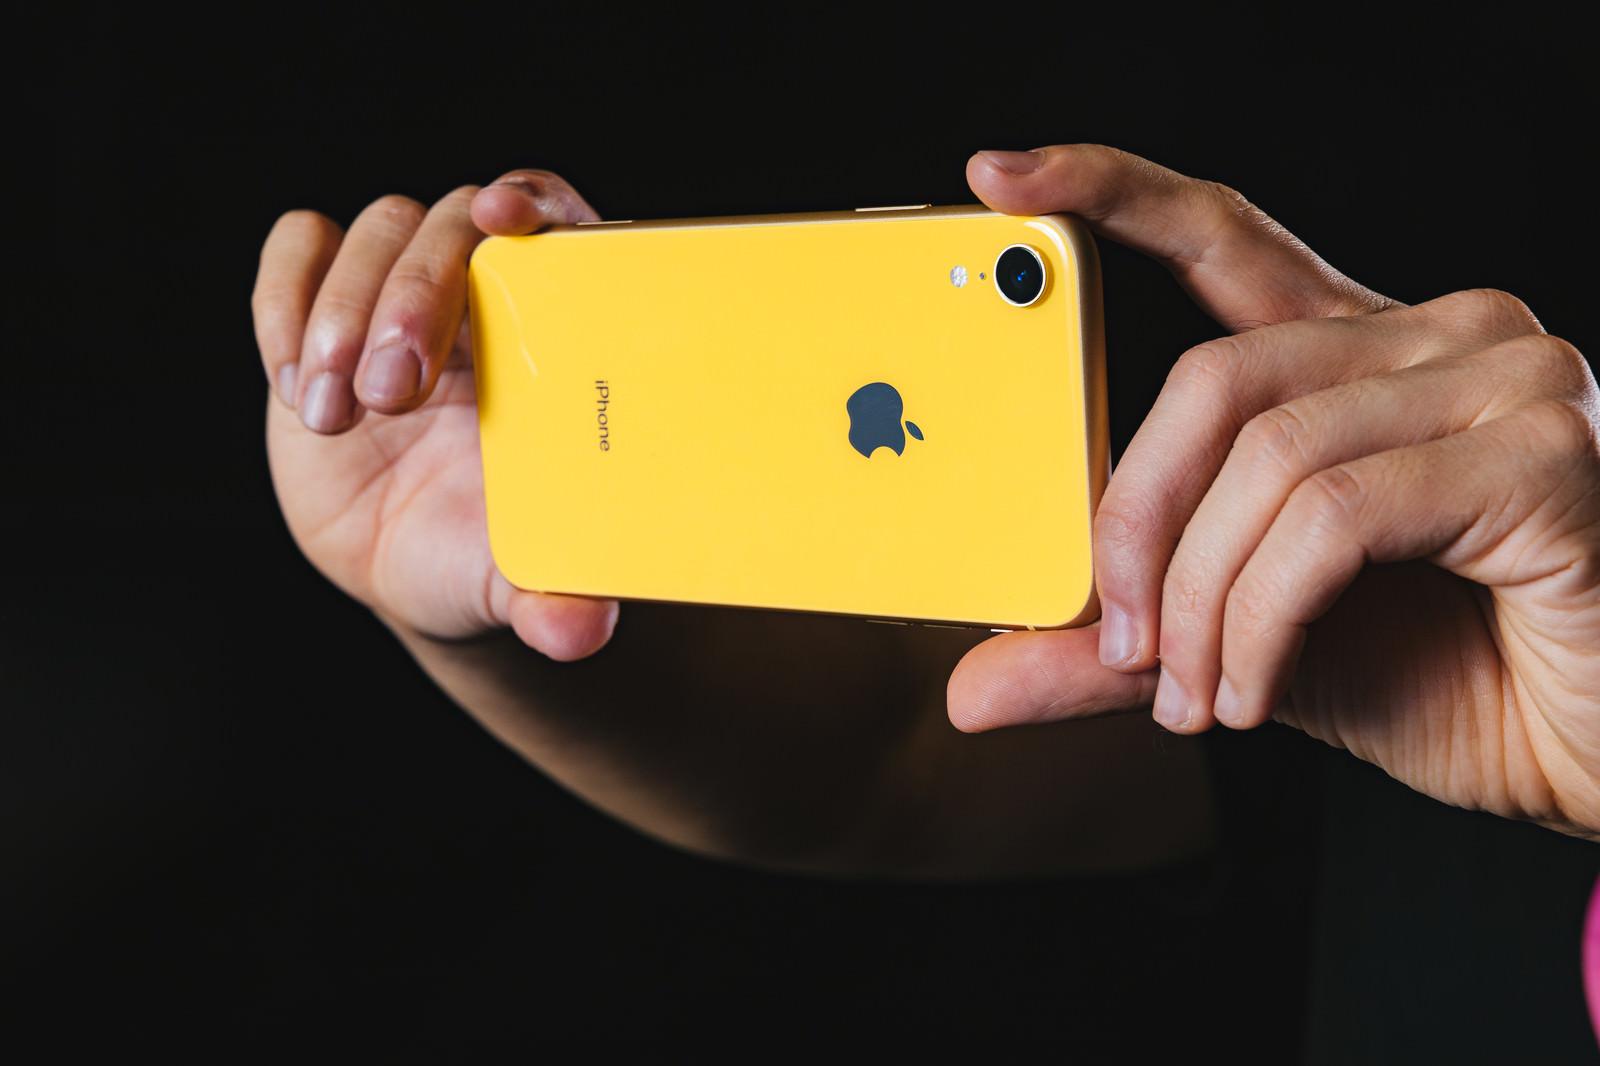 iPhoneXR の外向きカメラで撮影する様子のフリー画像(写真)